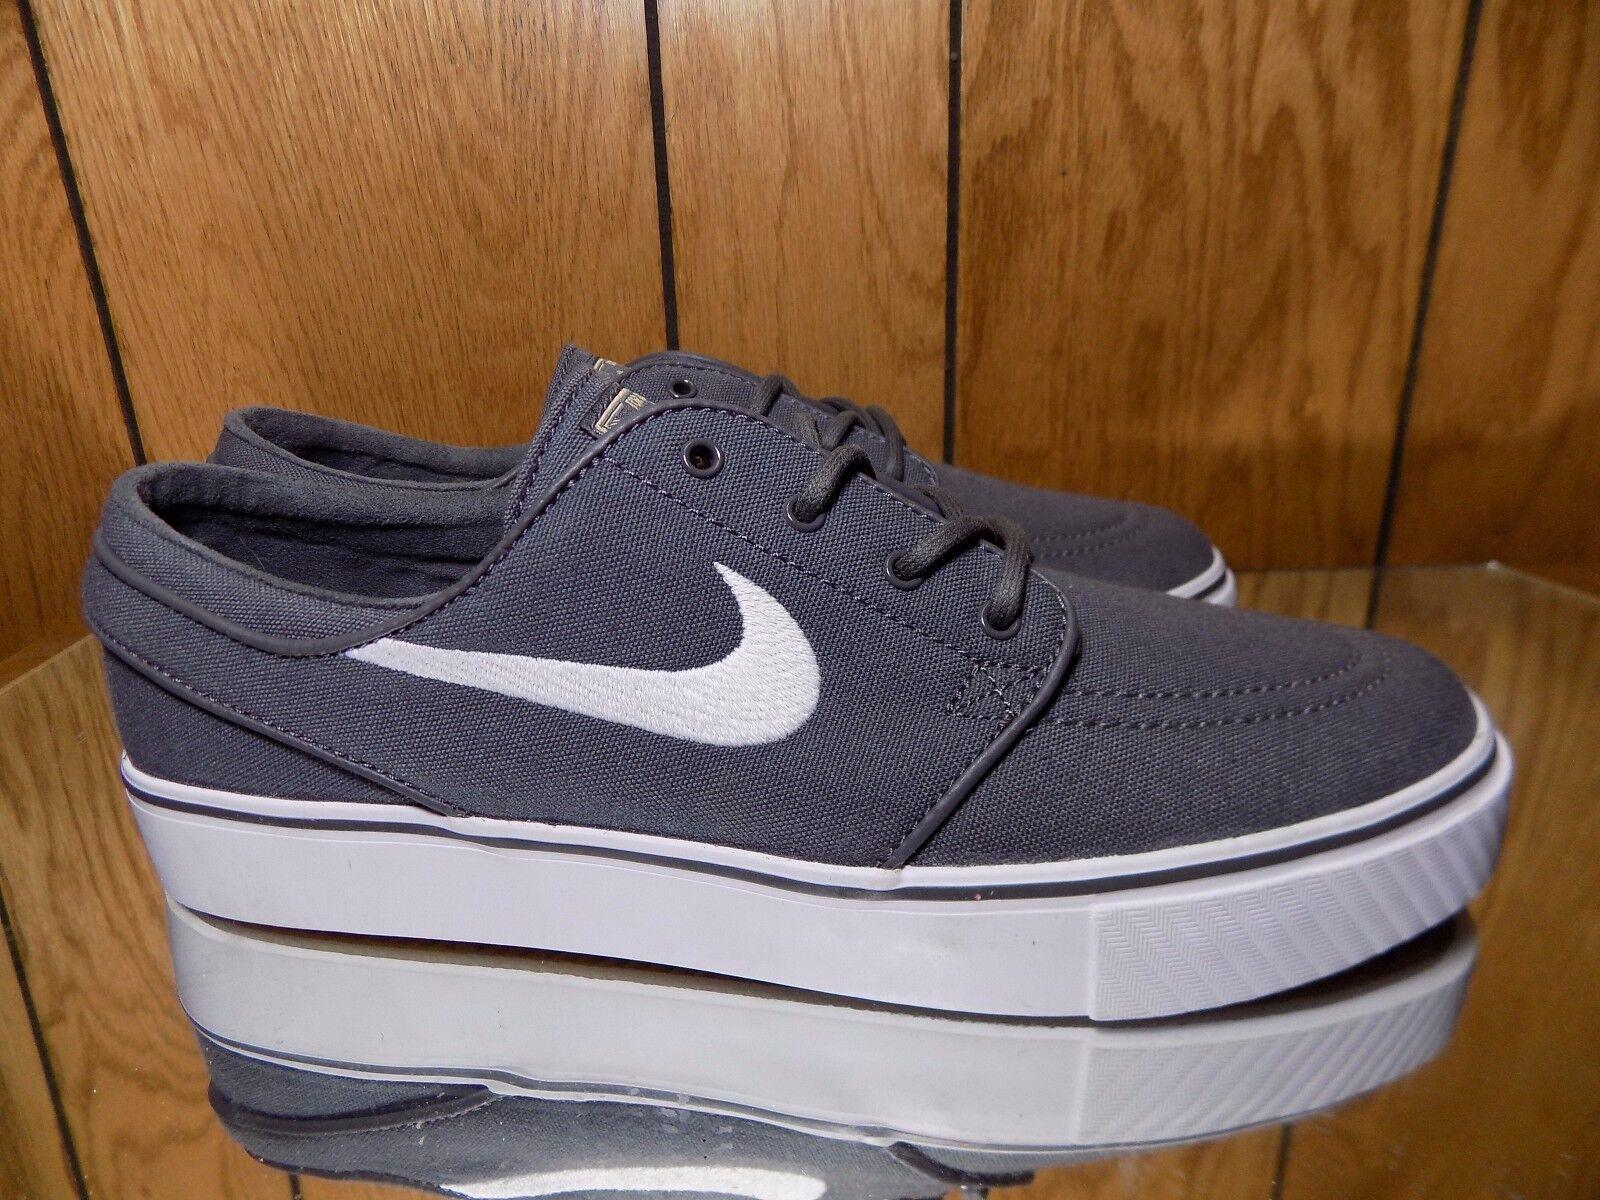 Nike sb zoom stefan janoski tela Uomo 615957-027 grey pattinare scorpe 7